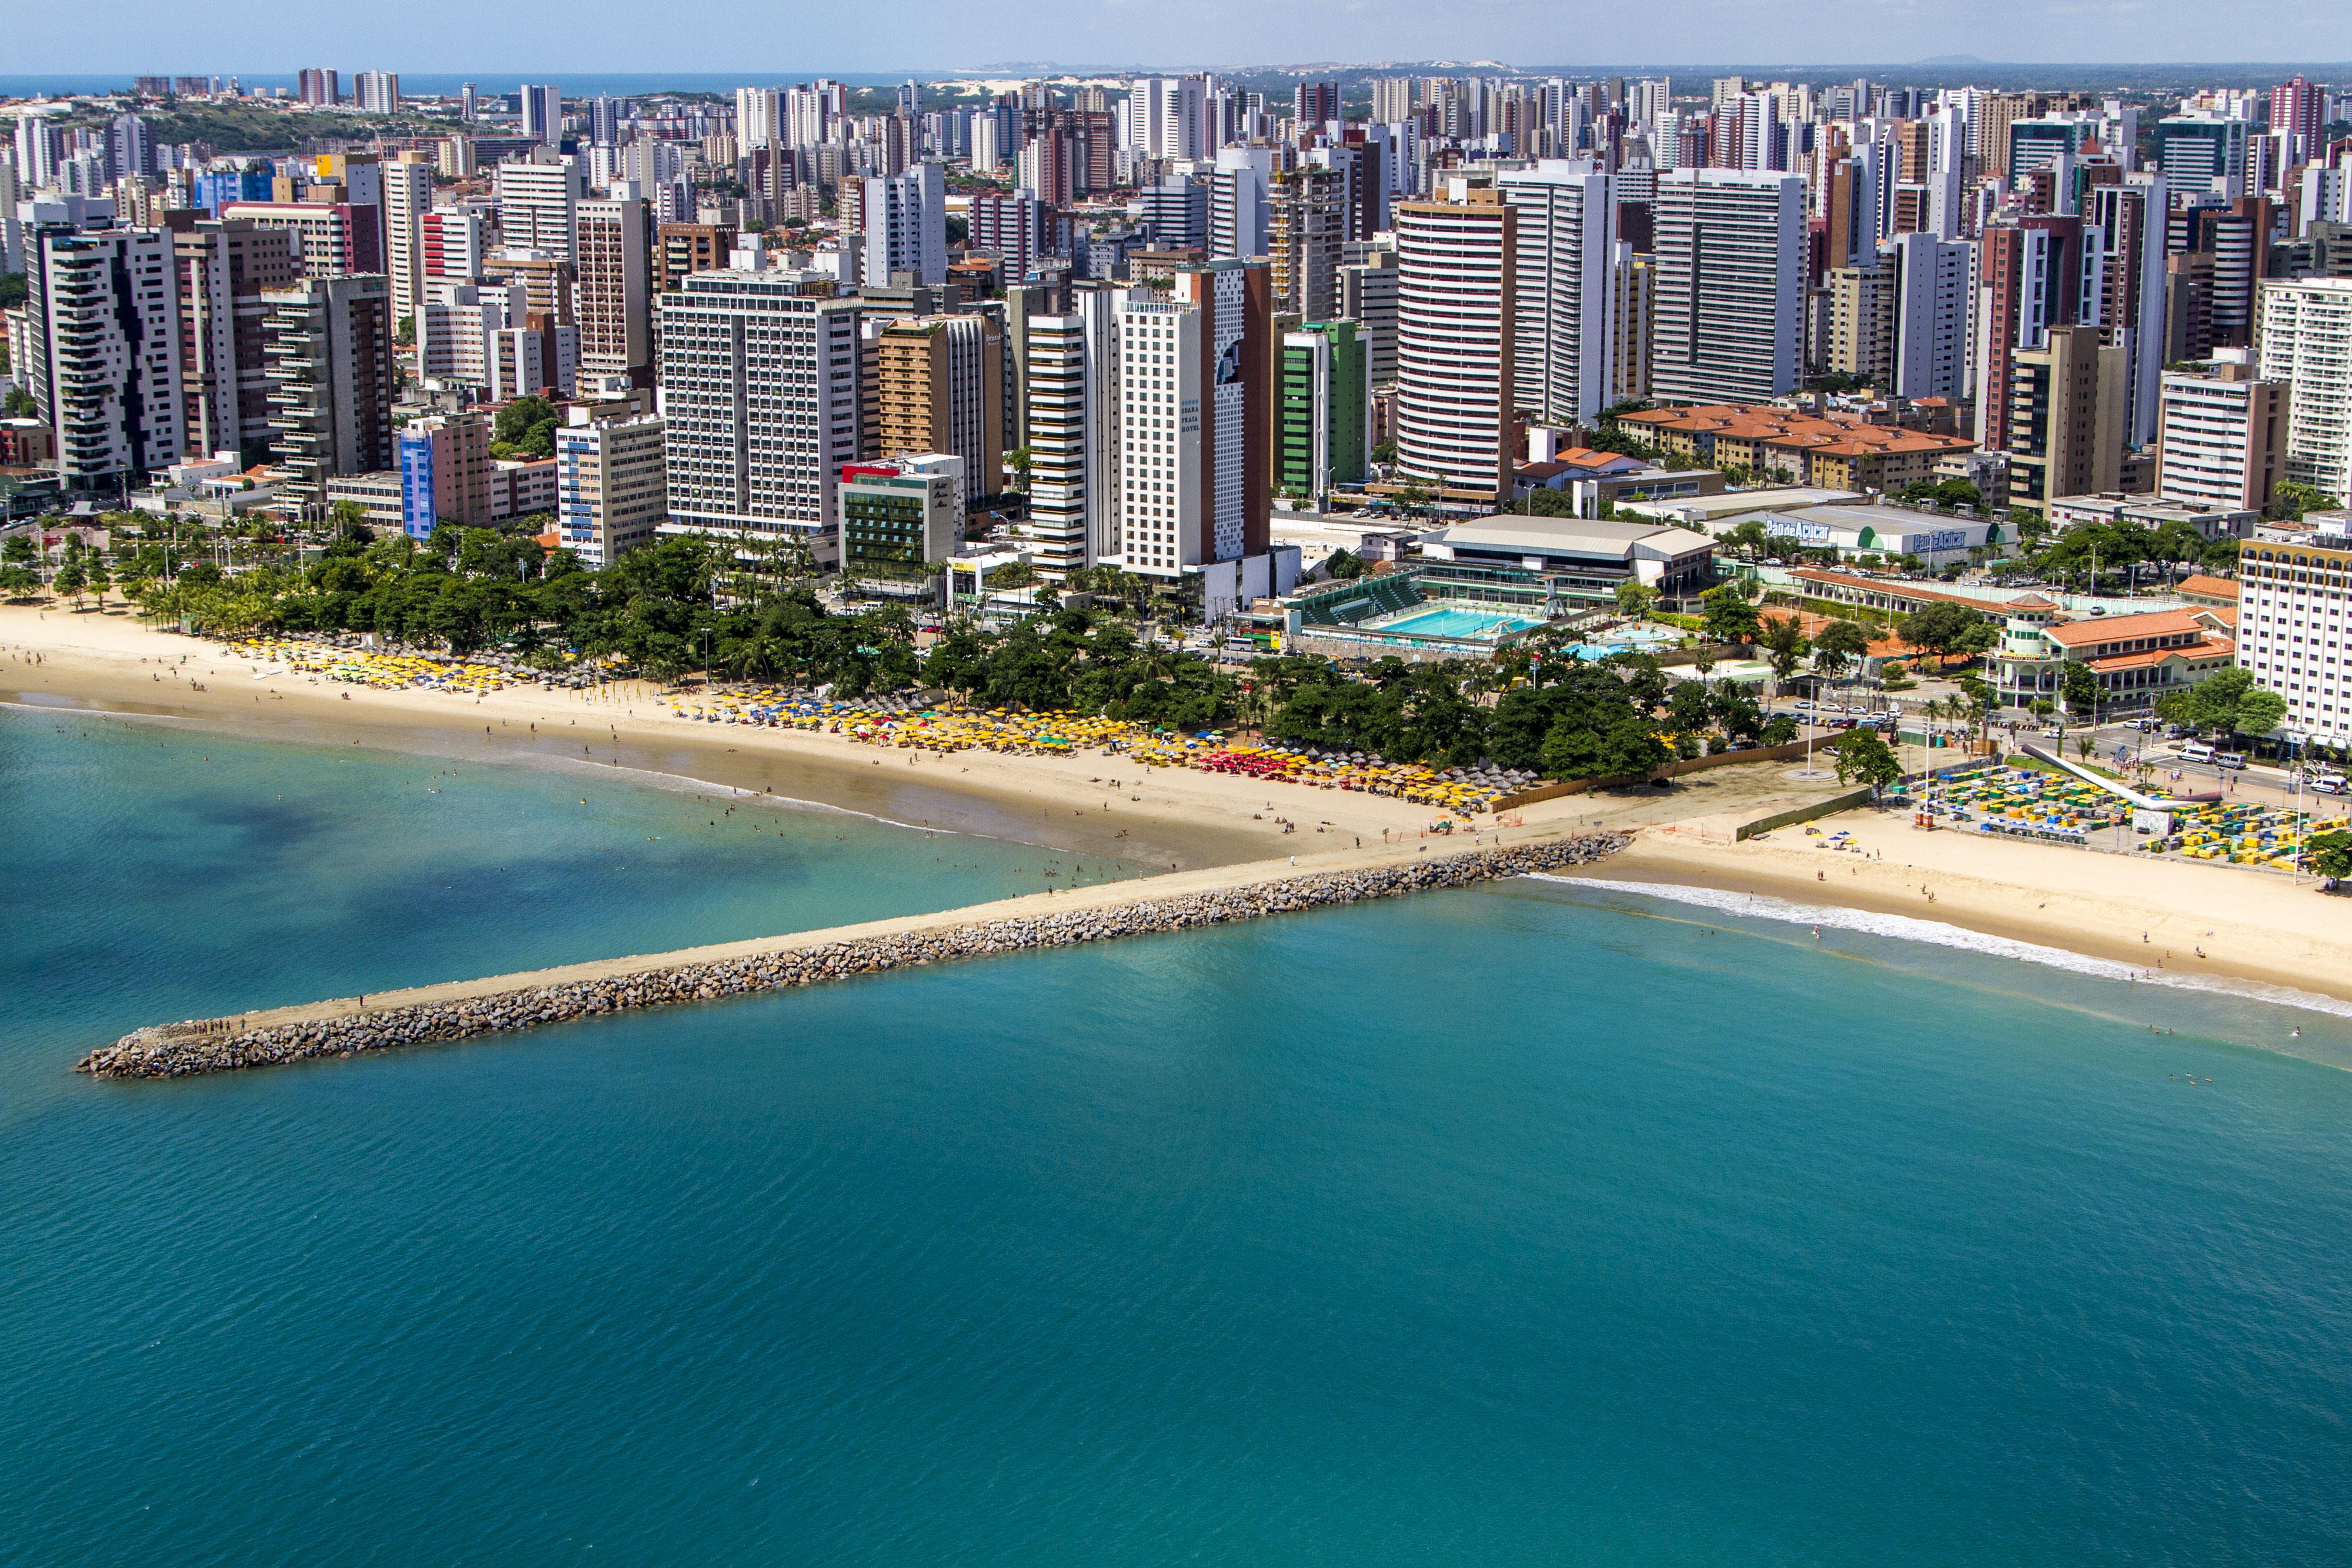 File:Seashore of Fortaleza (2).jpg - Wikimedia Commons